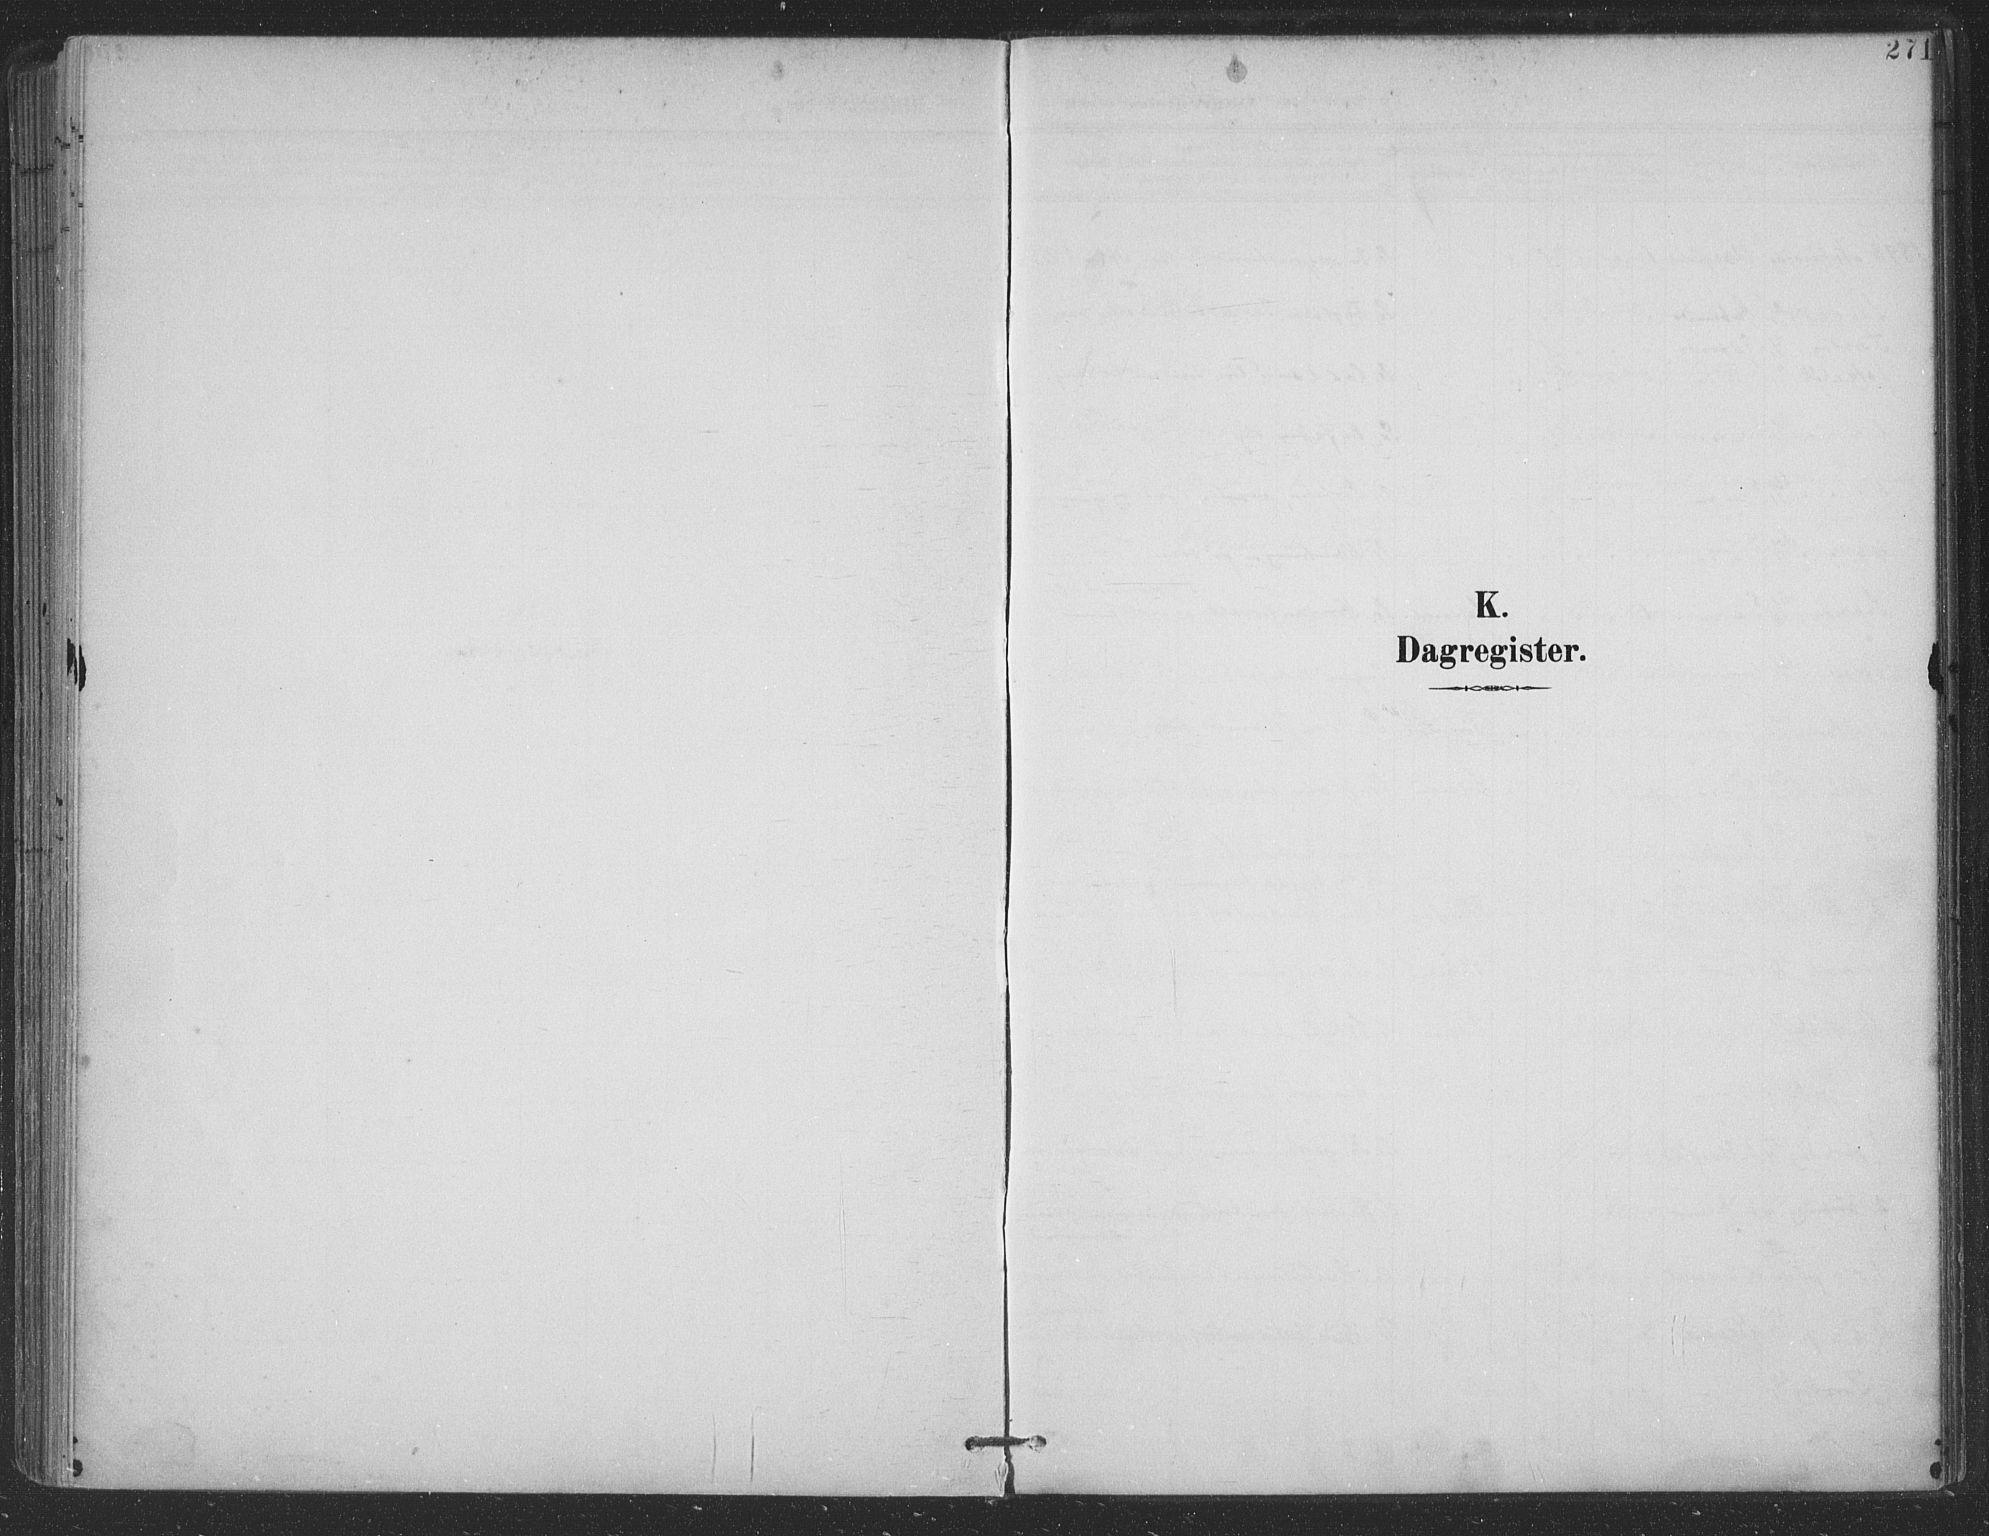 SAT, Ministerialprotokoller, klokkerbøker og fødselsregistre - Nordland, 863/L0899: Ministerialbok nr. 863A11, 1897-1906, s. 271